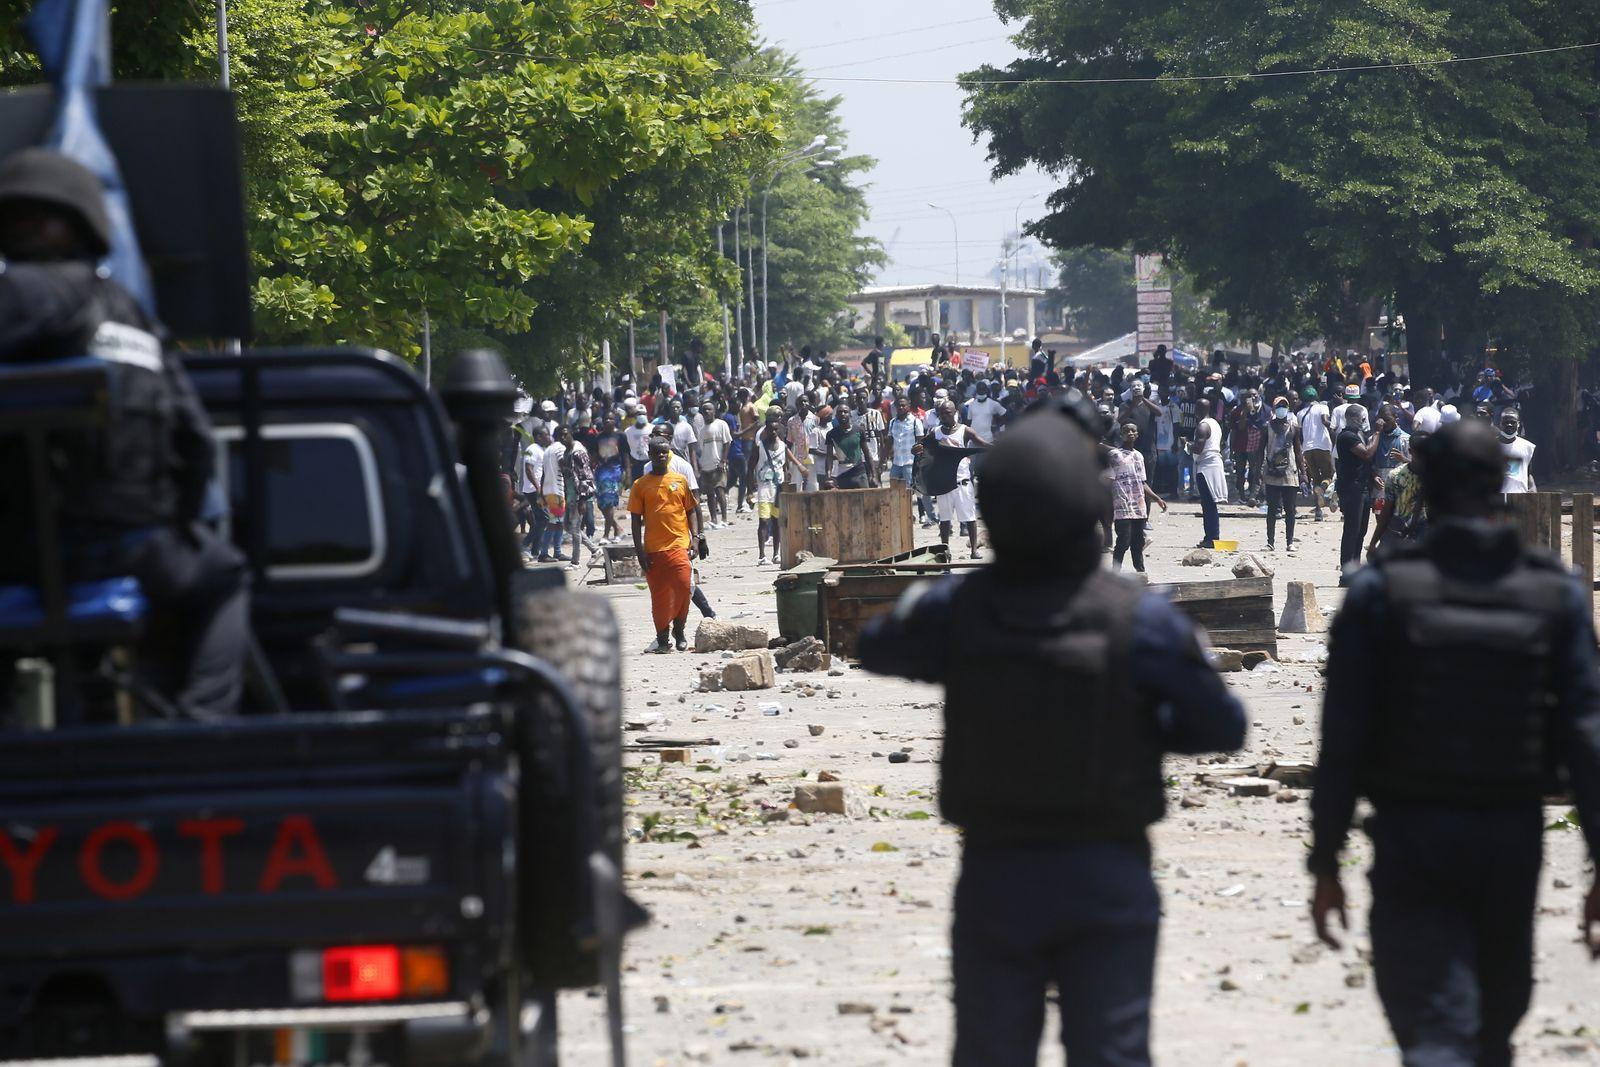 Former president Gbagbo to return to Ivory Coast